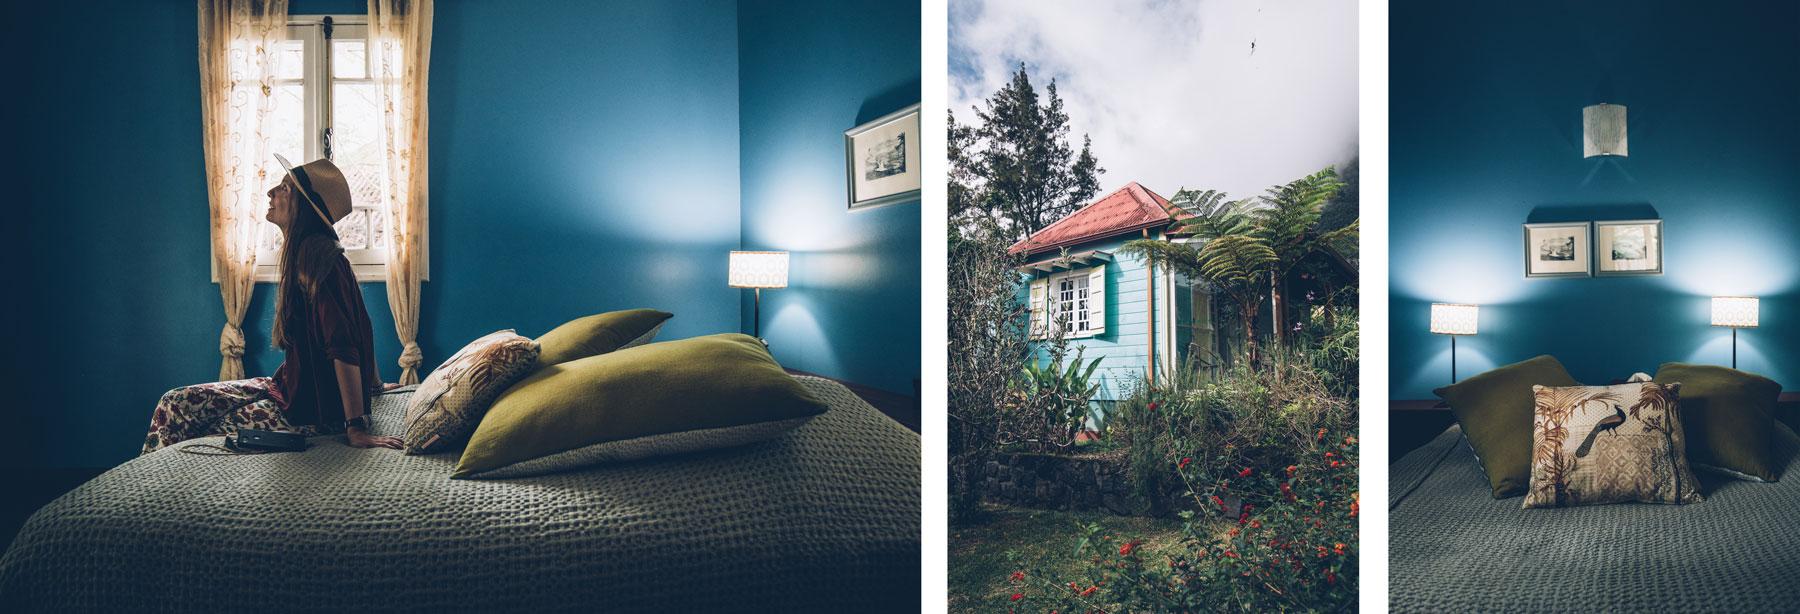 Hotel Hell Bourg La Réunion, Le Jardin D'Héva